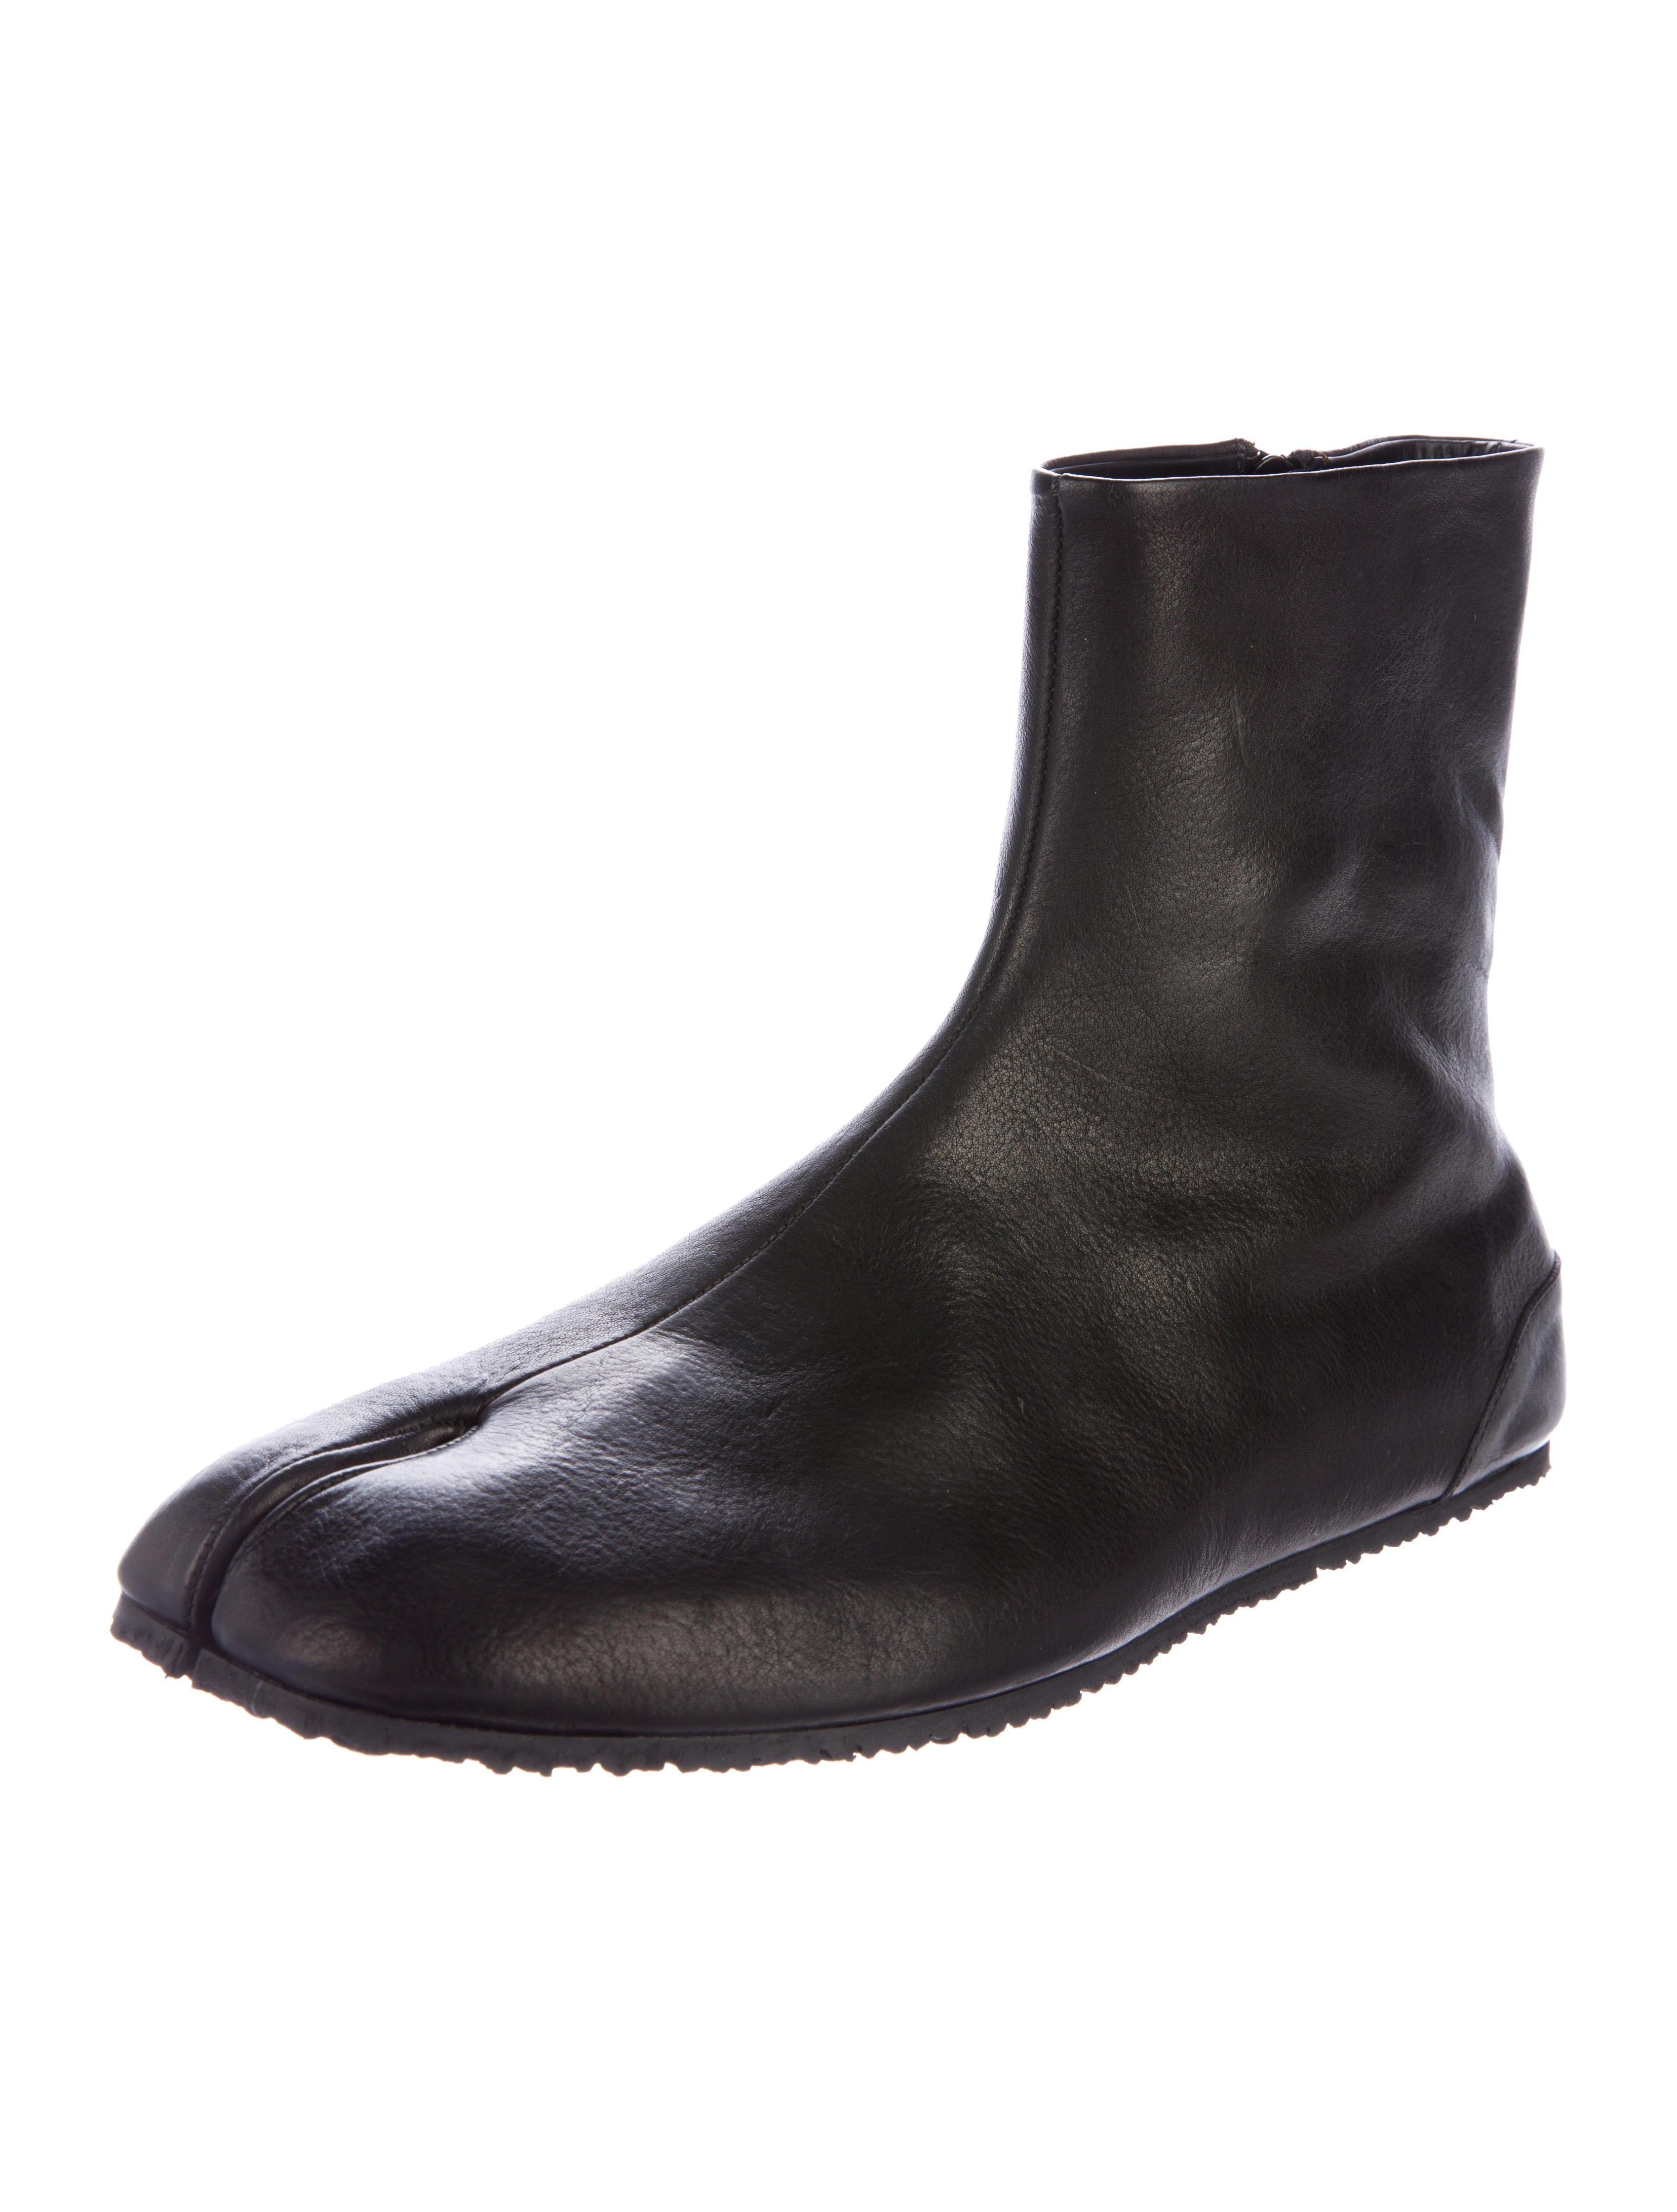 Maison Margiela Leather Tabi Boots - Shoes